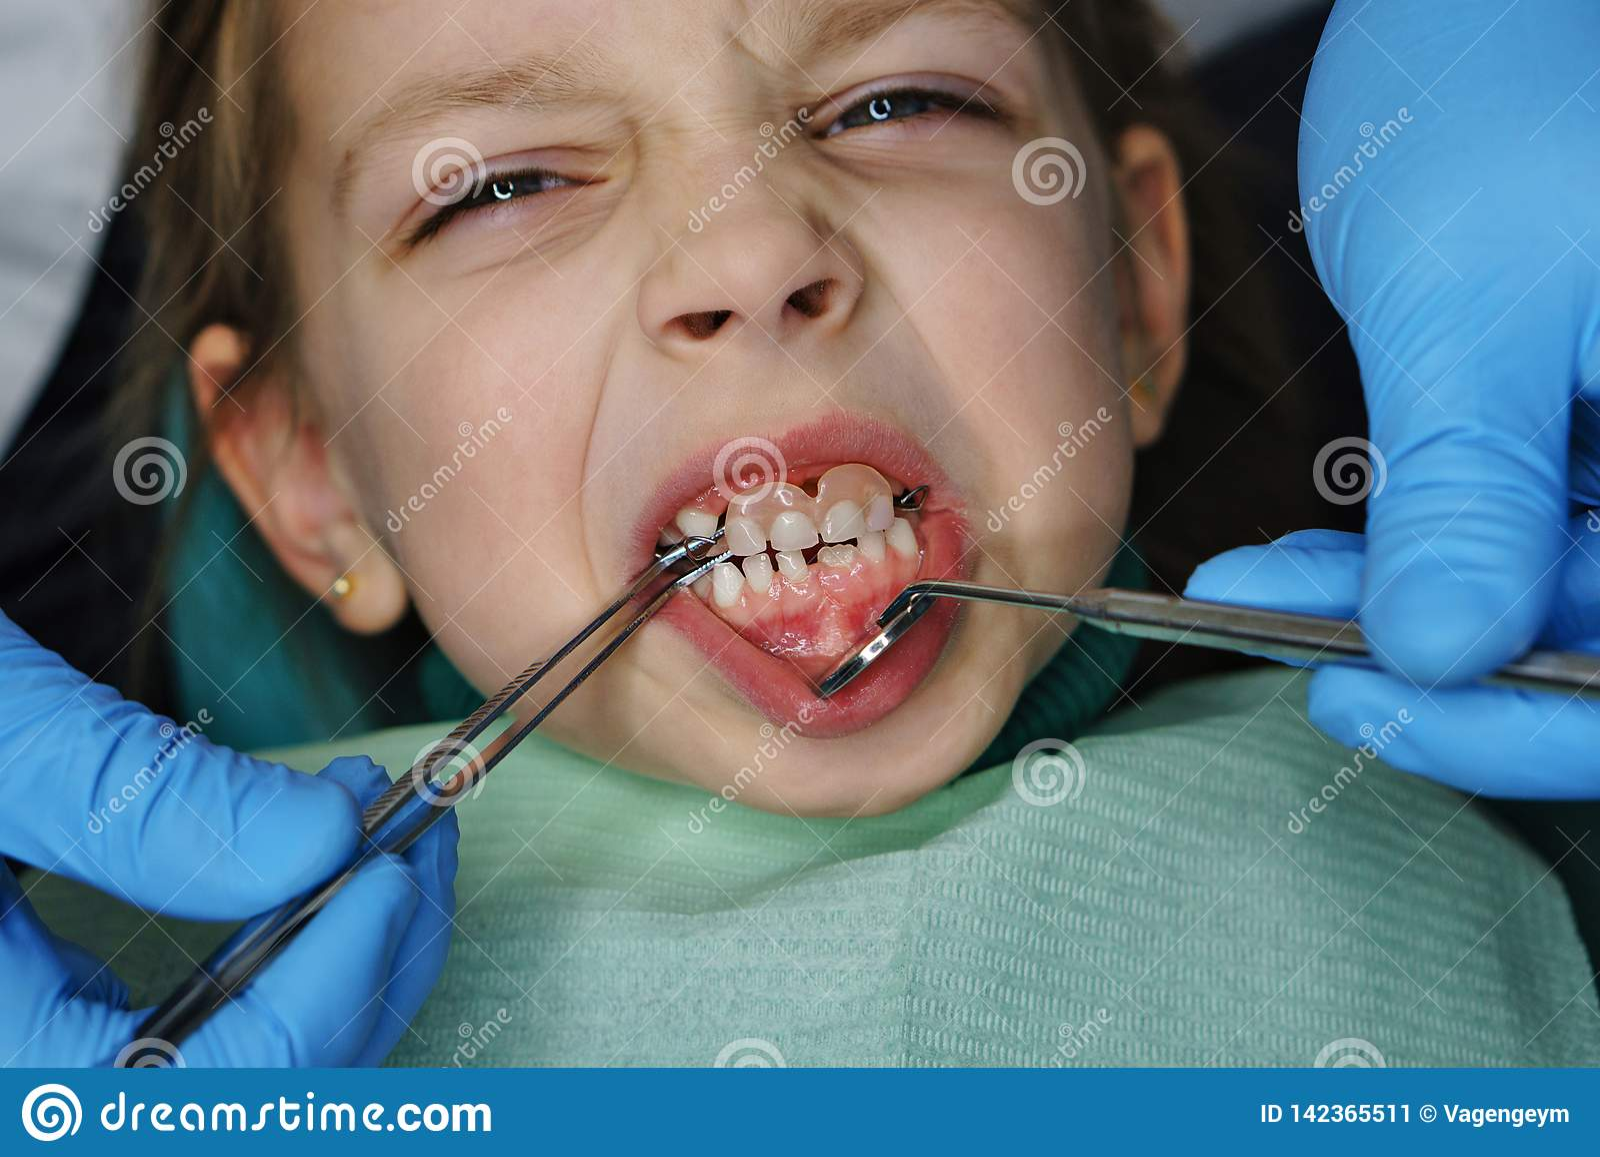 Little girl at dentist on examination